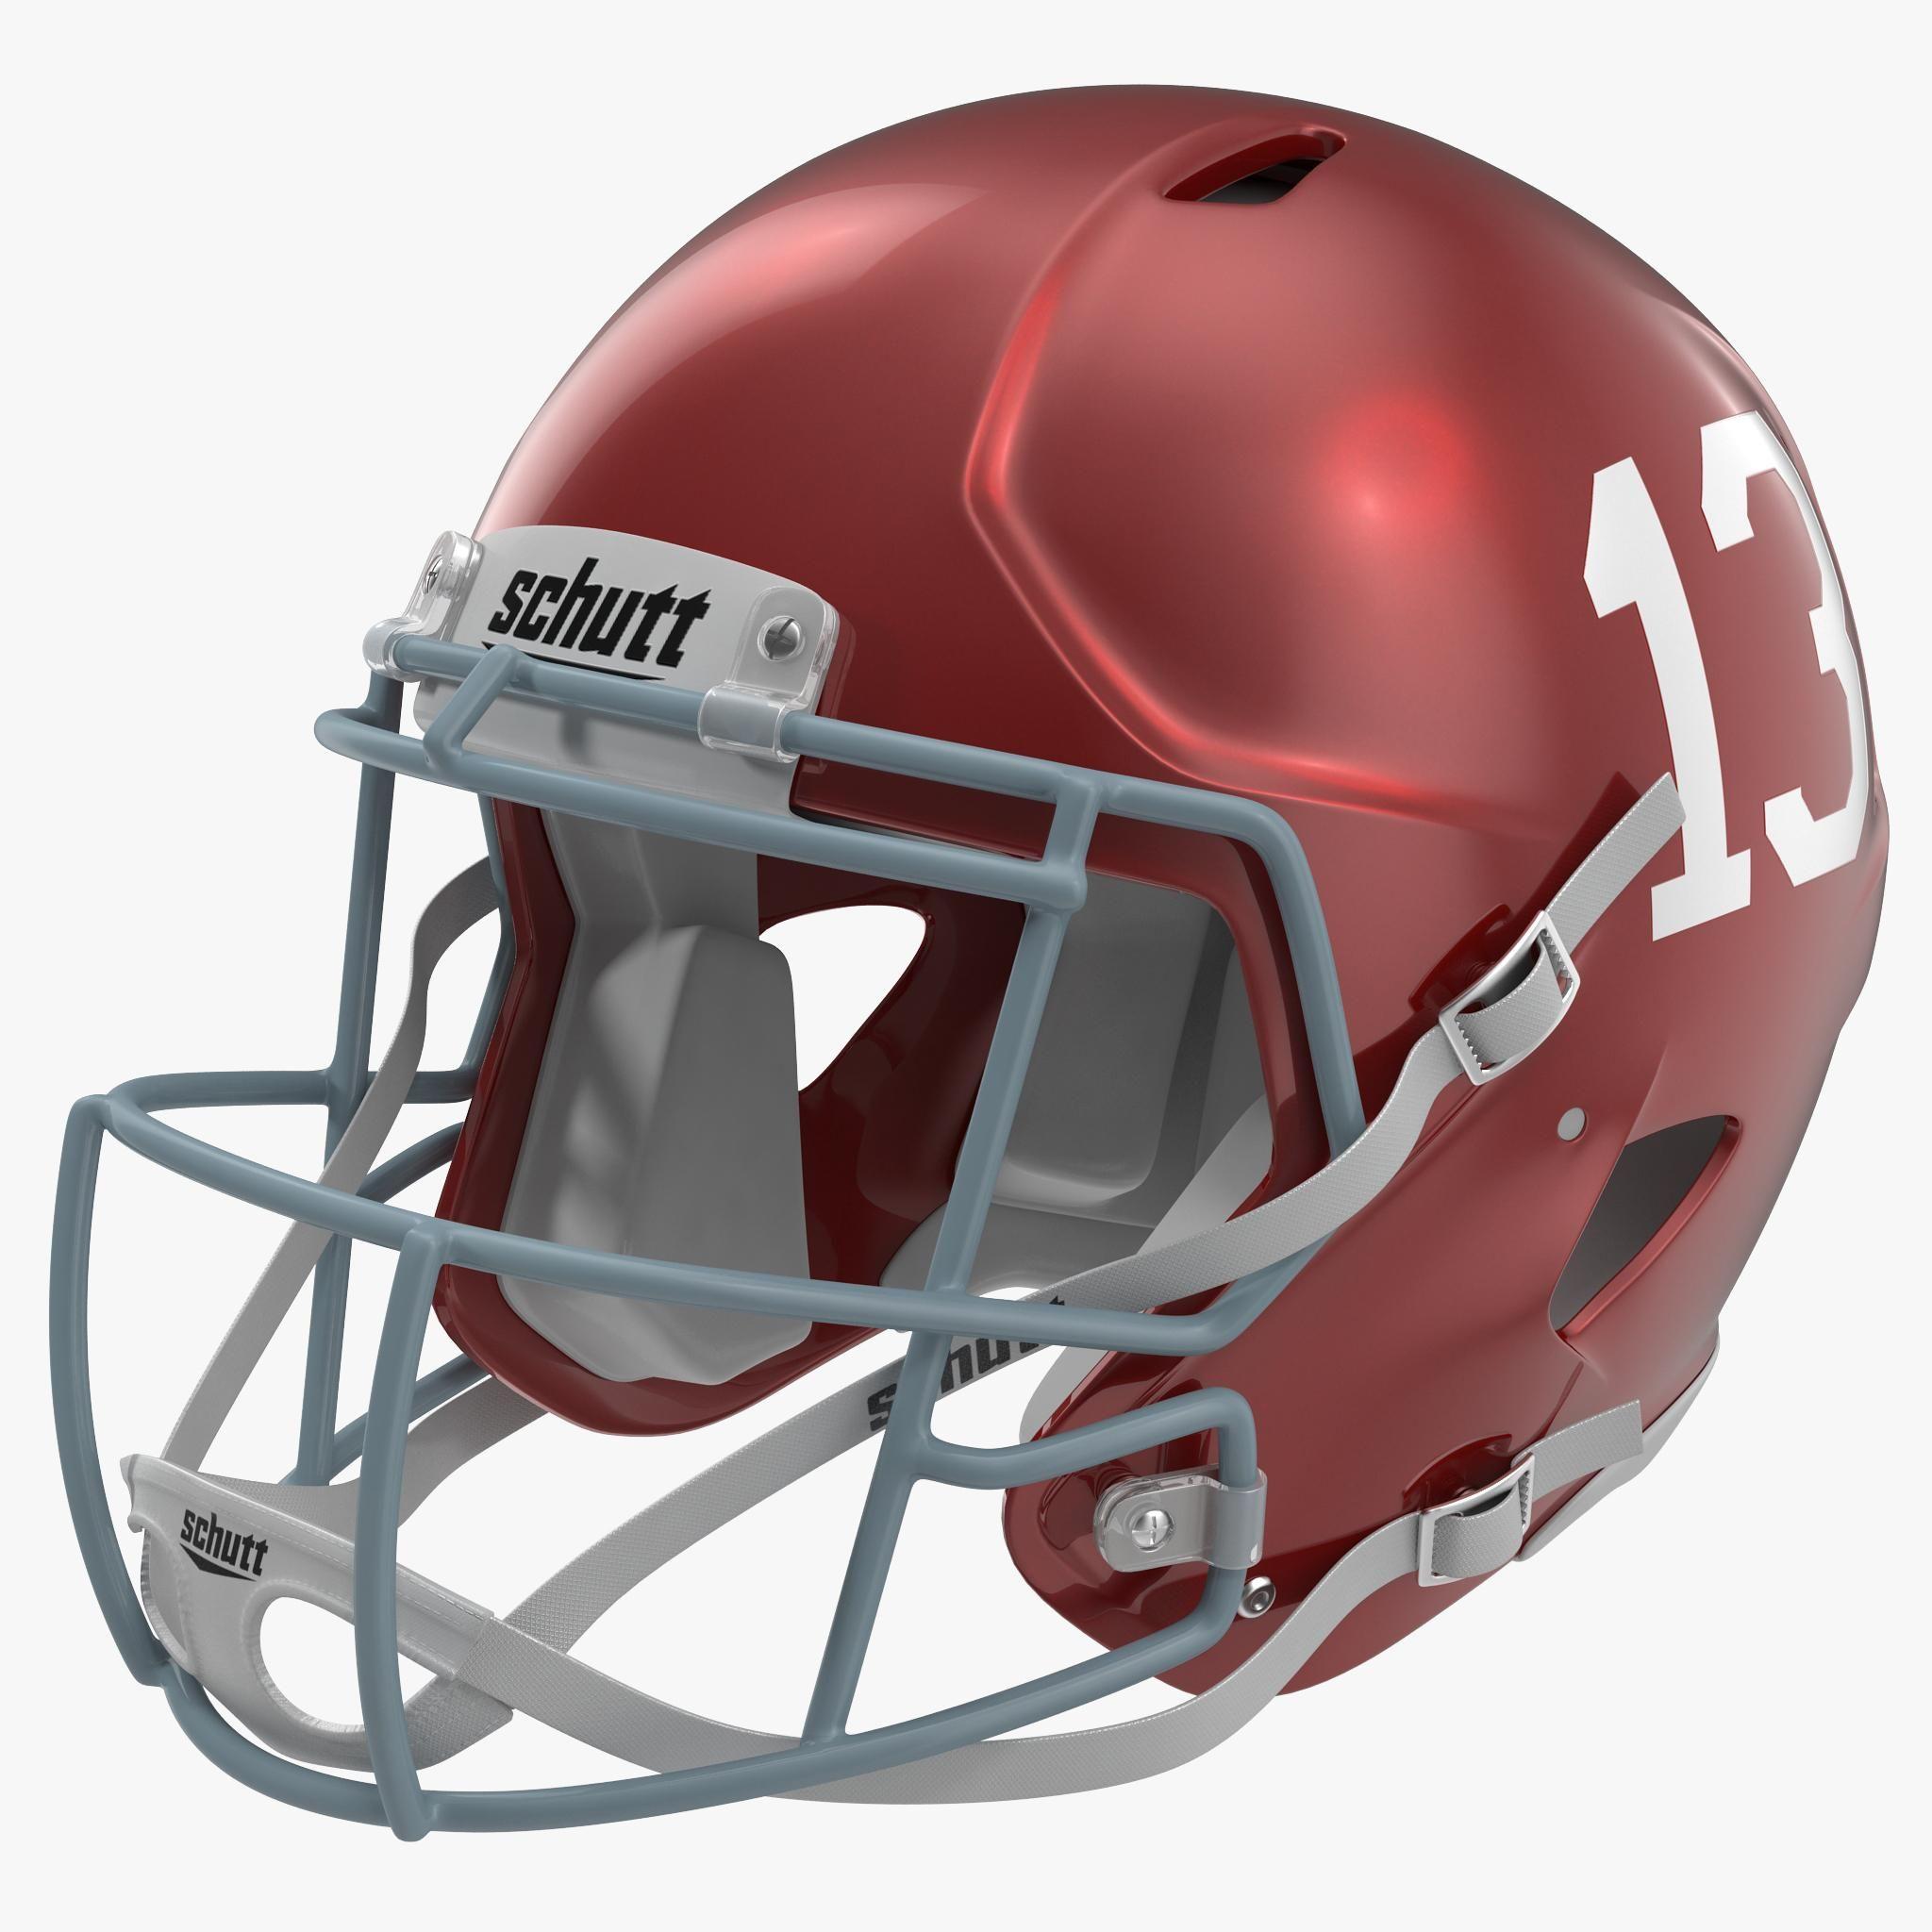 schutt football helmets face masks